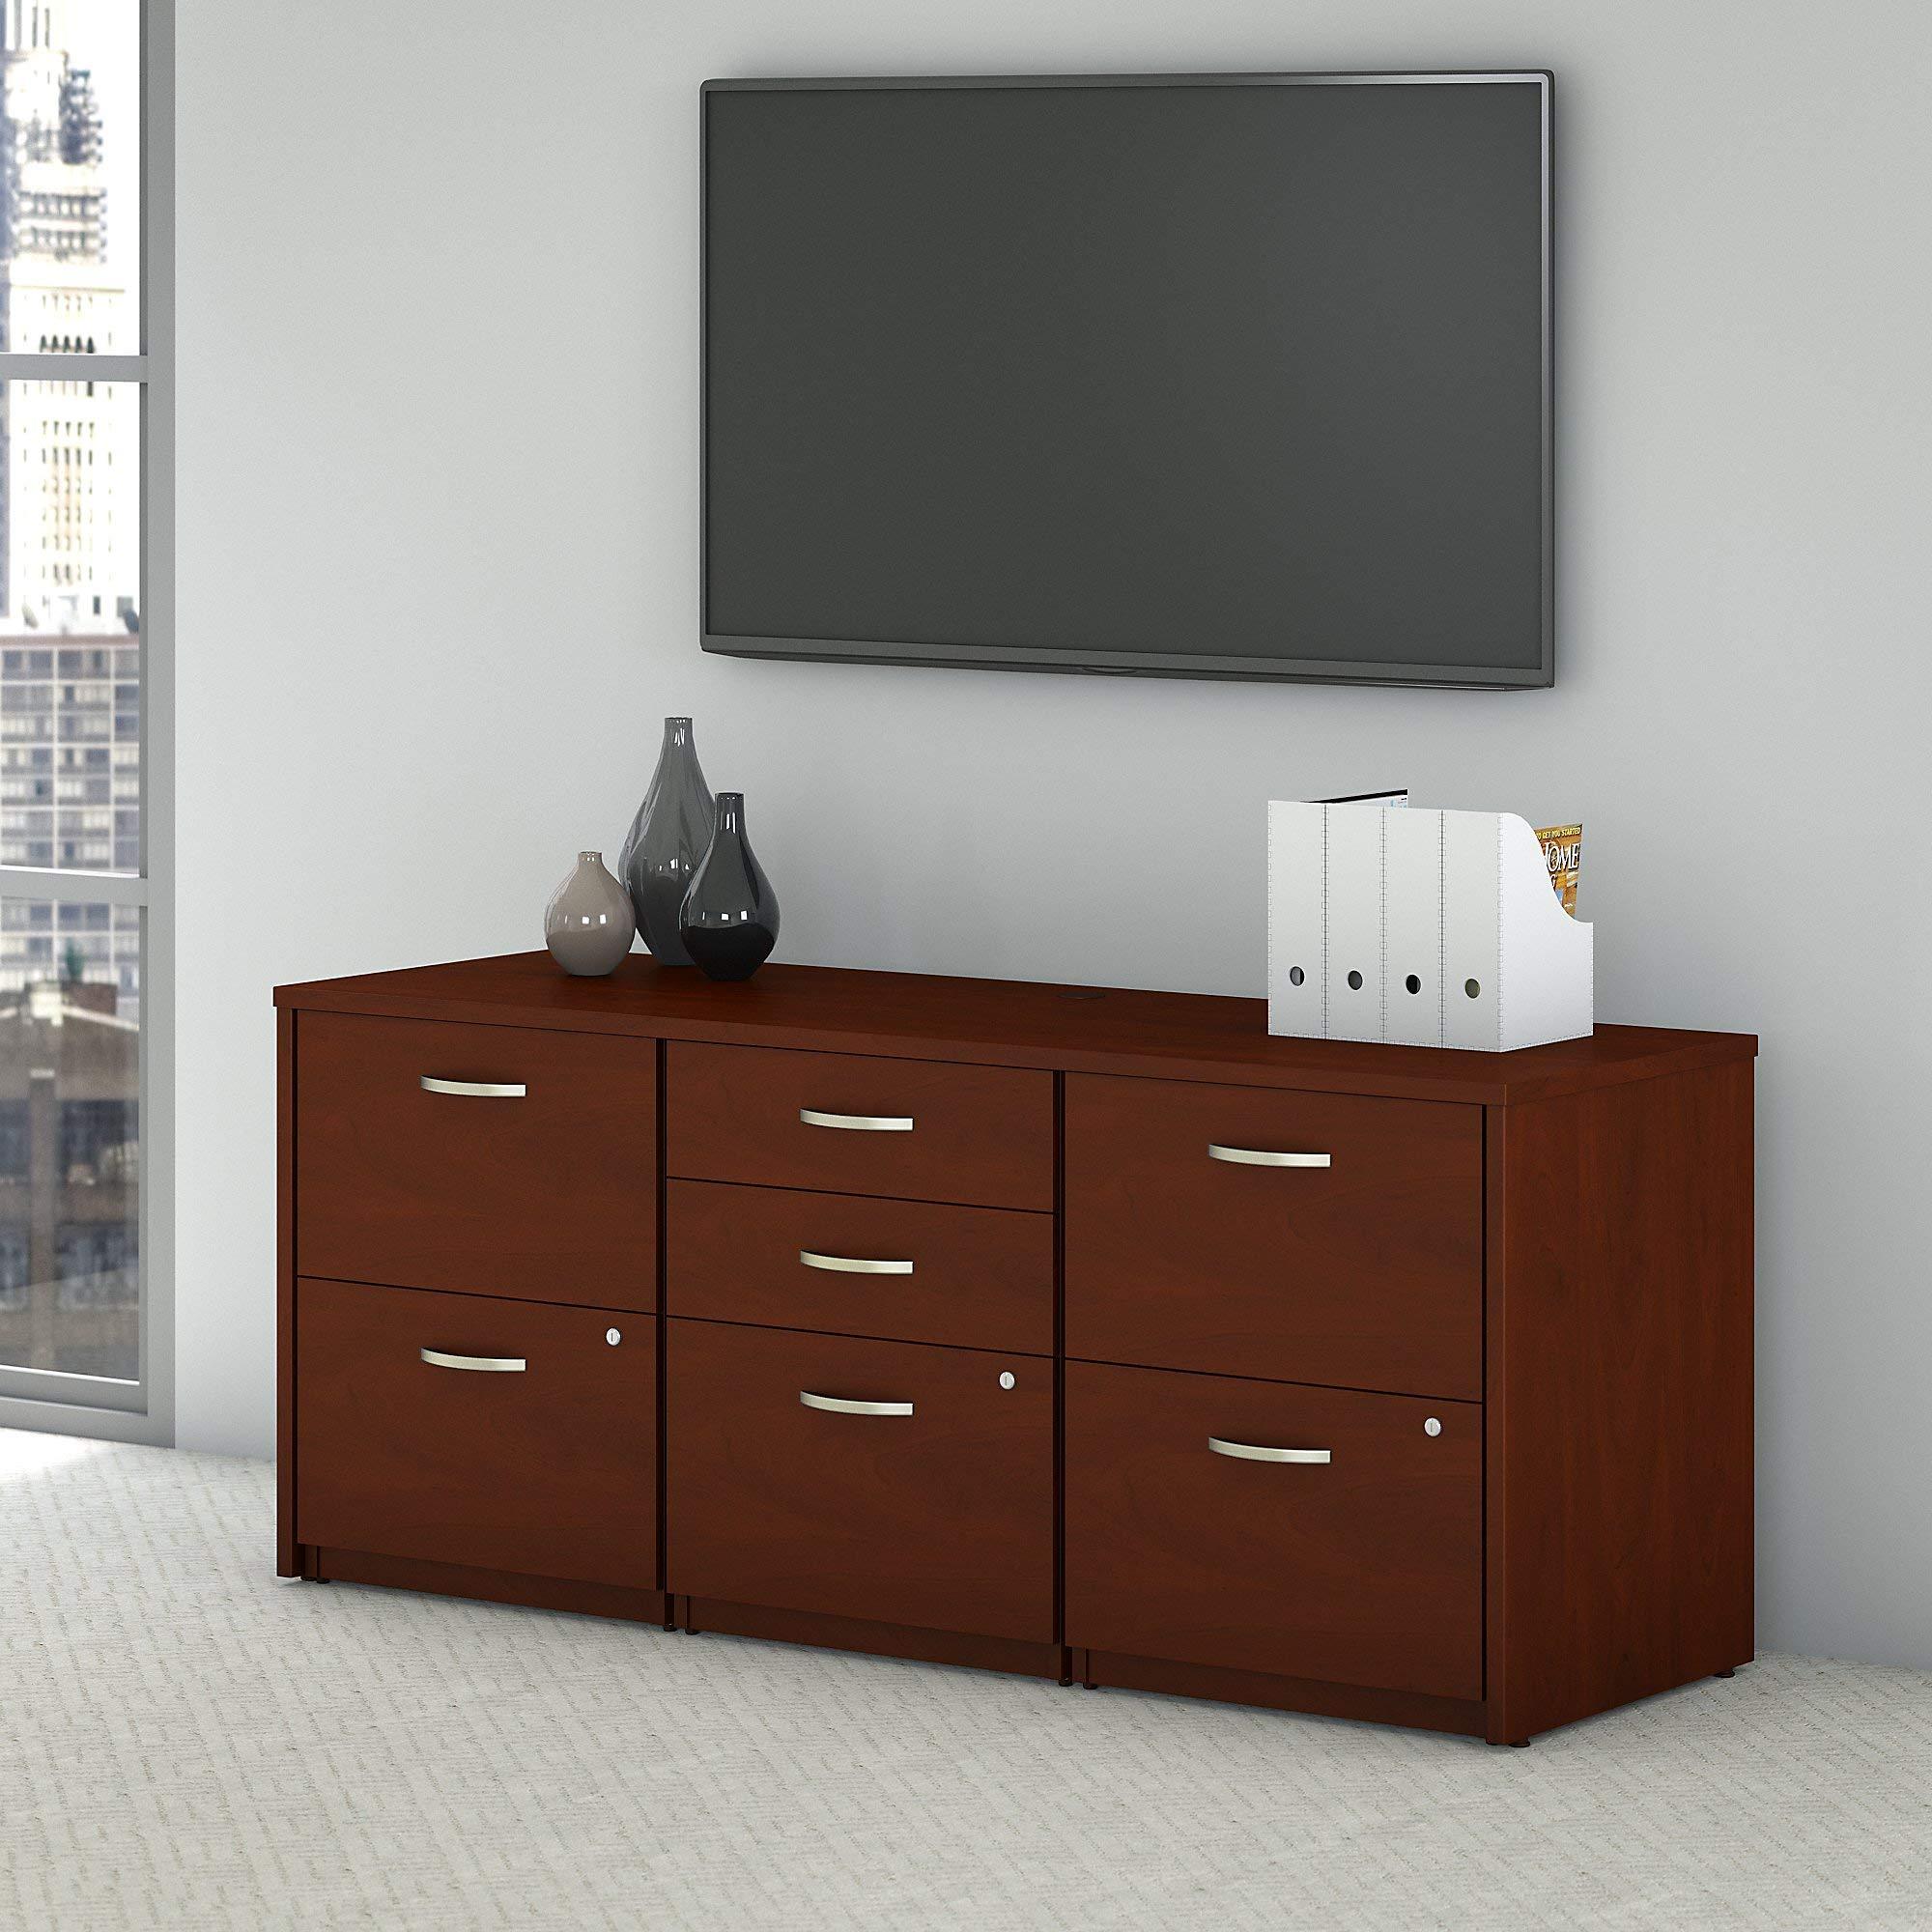 Bush Business Furniture Series C Elite Storage Credenza, Hansen Cherry by Bush Business Furniture (Image #2)